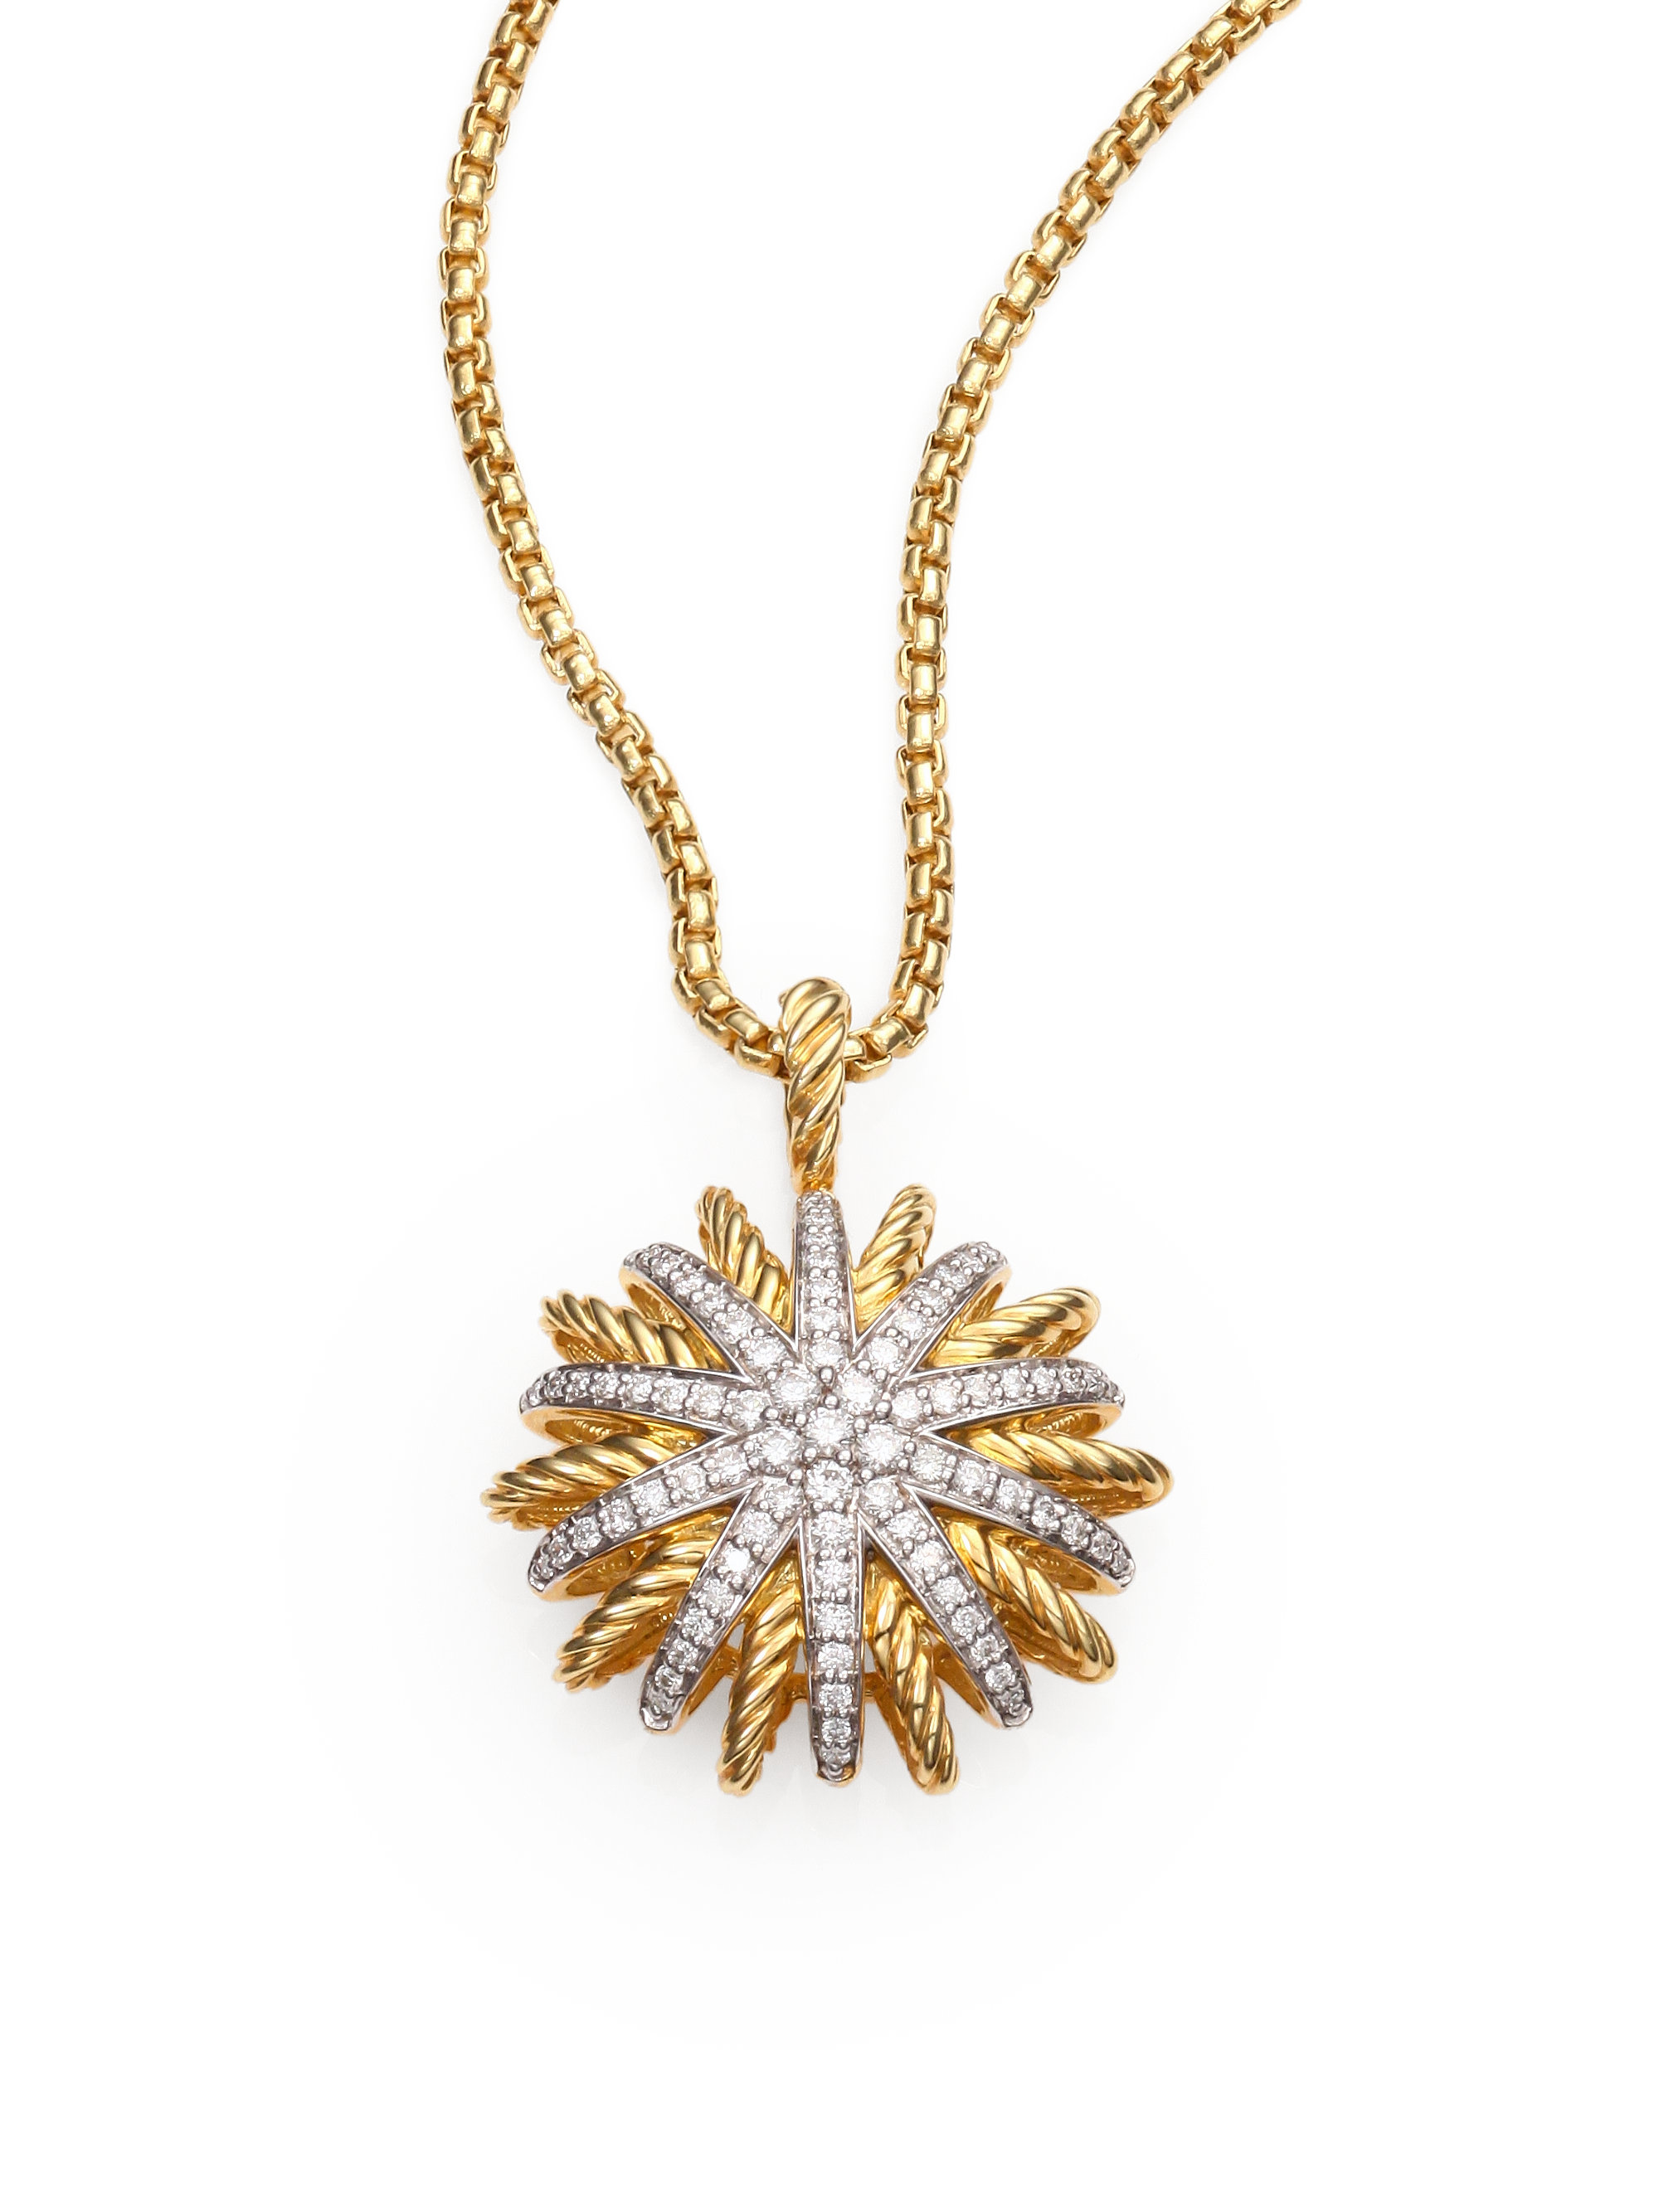 David Yurman Diamond 18k Gold Starburst Pendant Necklace